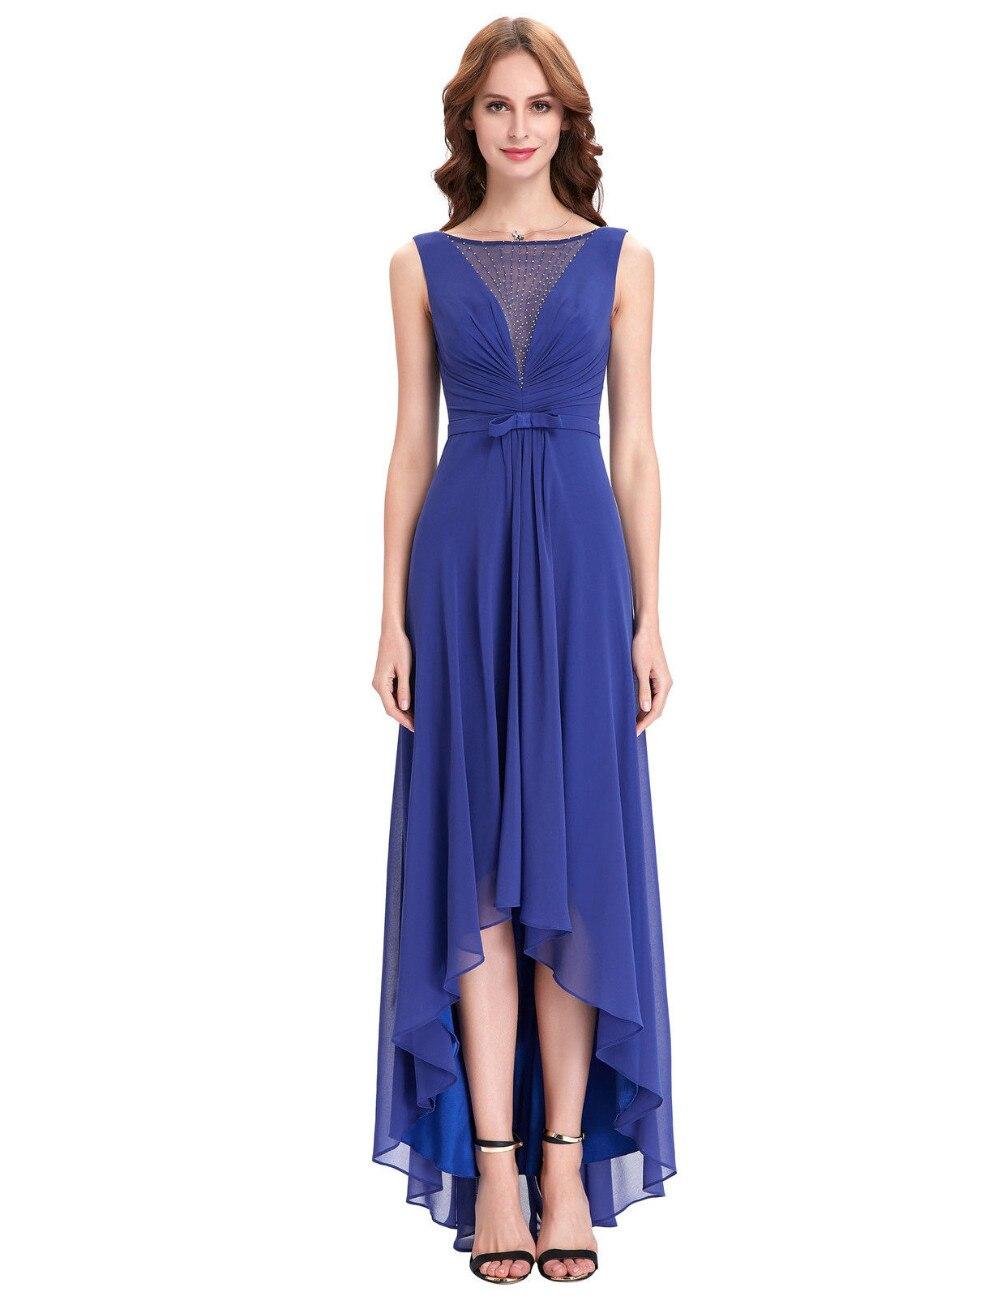 Royal Blue Bridesmaids Dresses Short Front Long Back